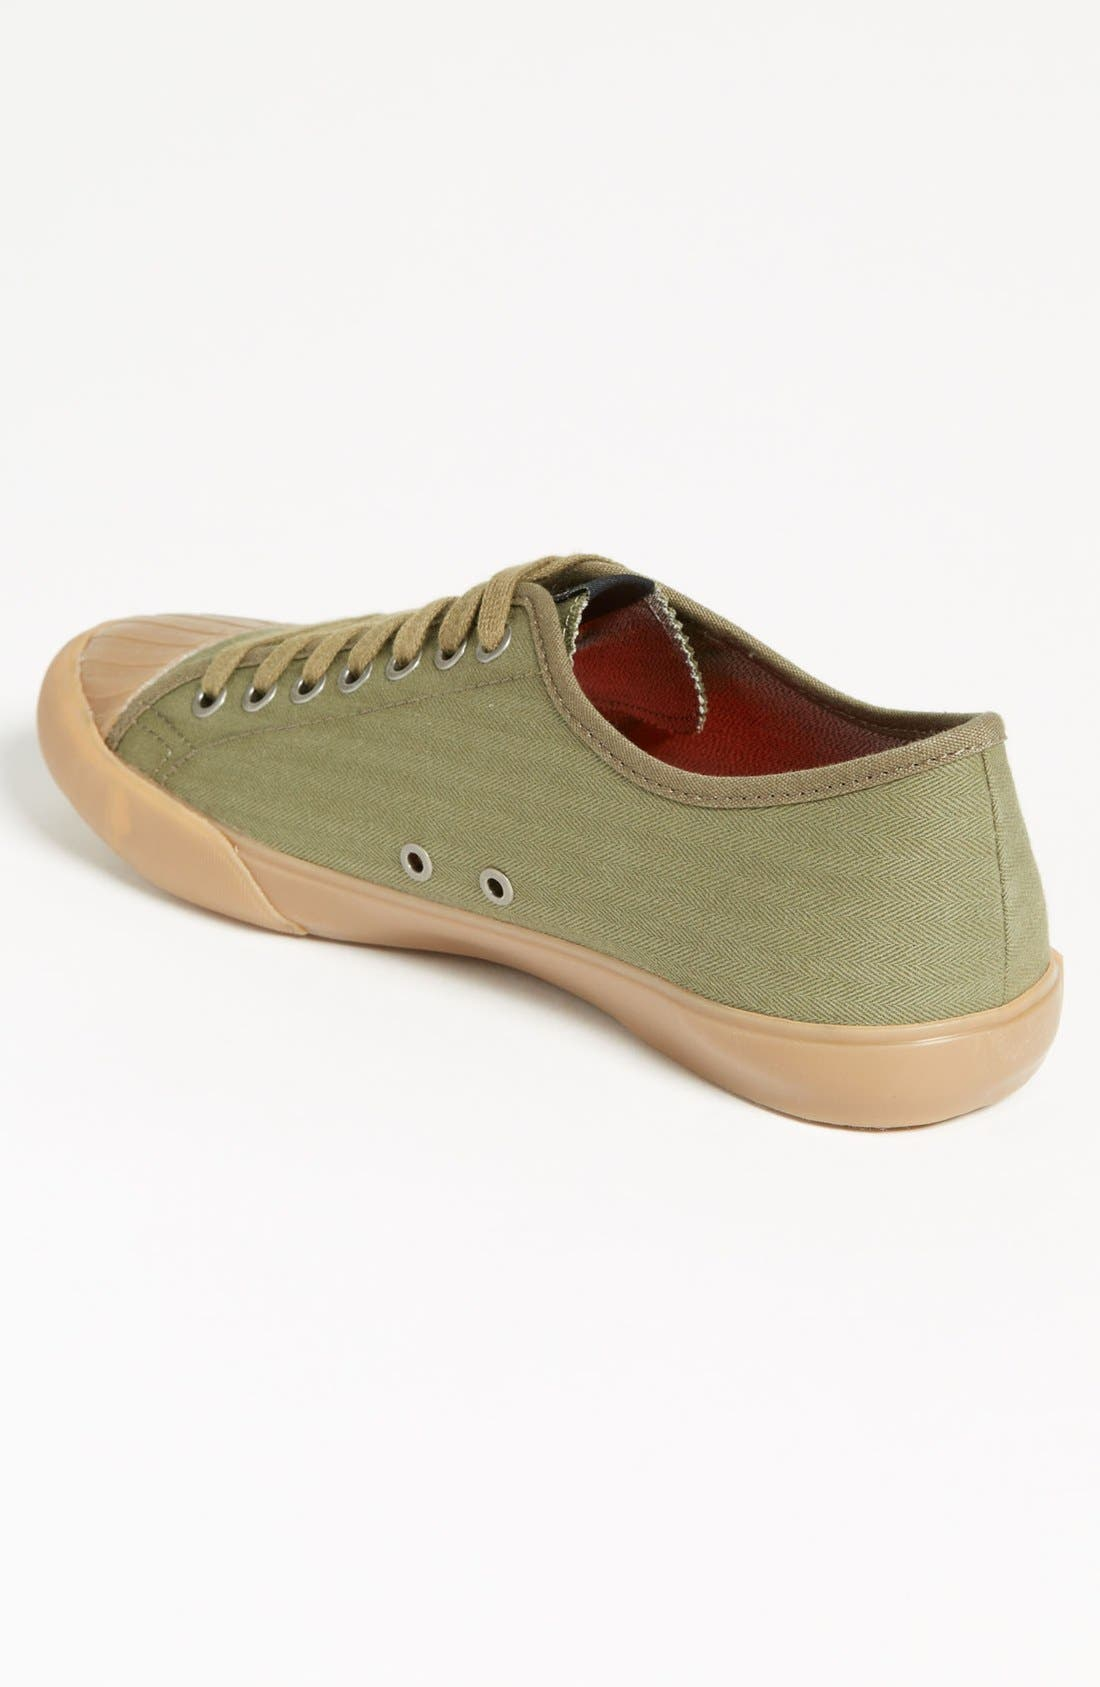 Alternate Image 2  - SeaVees '08/61 Army Issue' Low Sneaker